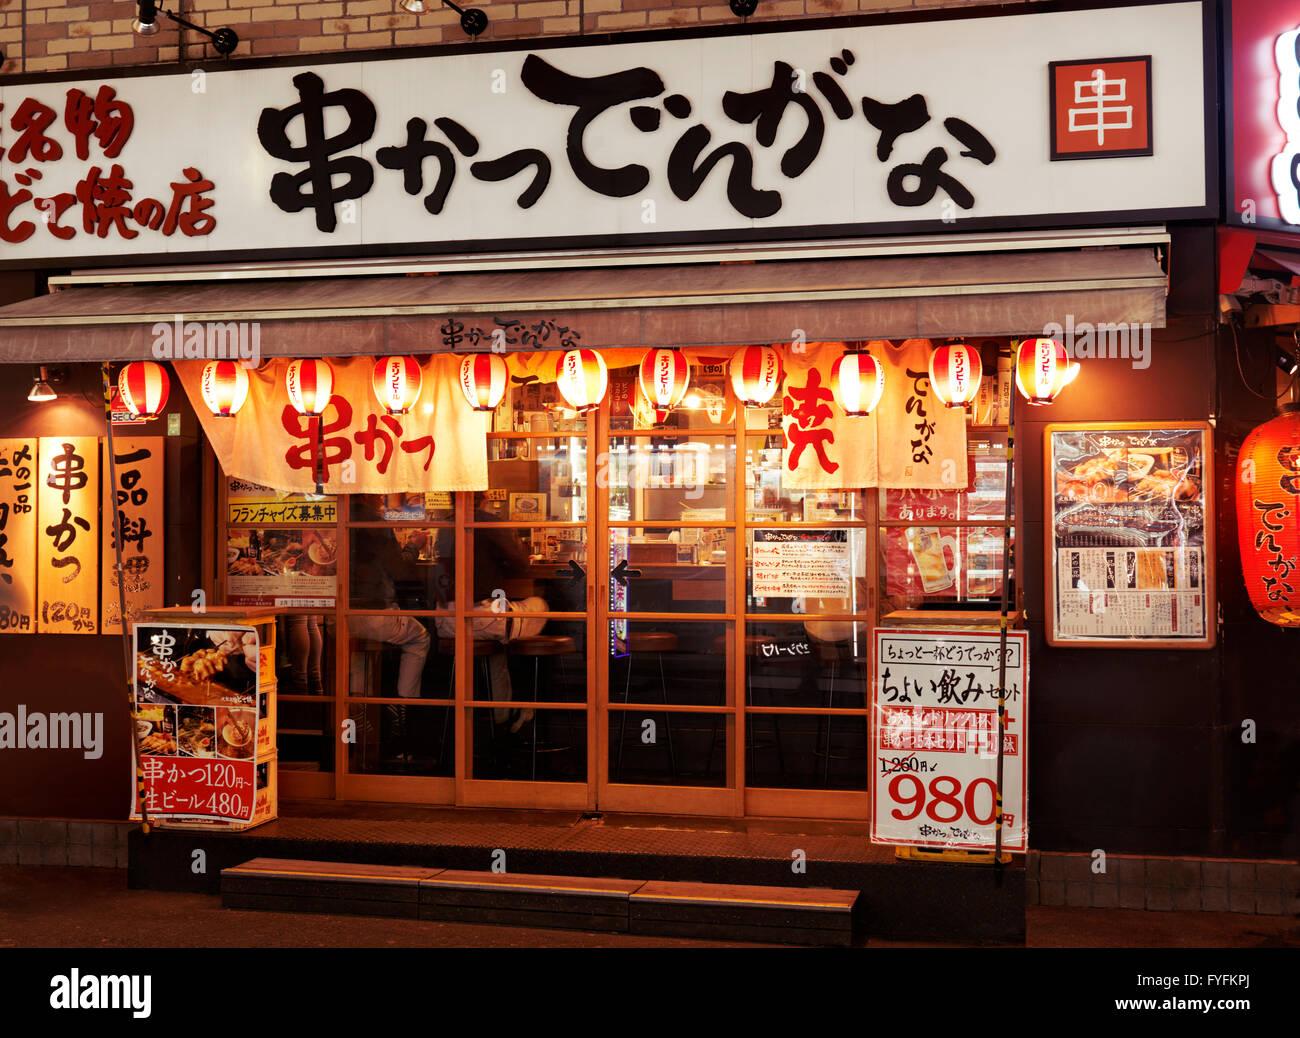 Ristorante giapponese, Shinjuku, Tokyo, Giappone Immagini Stock